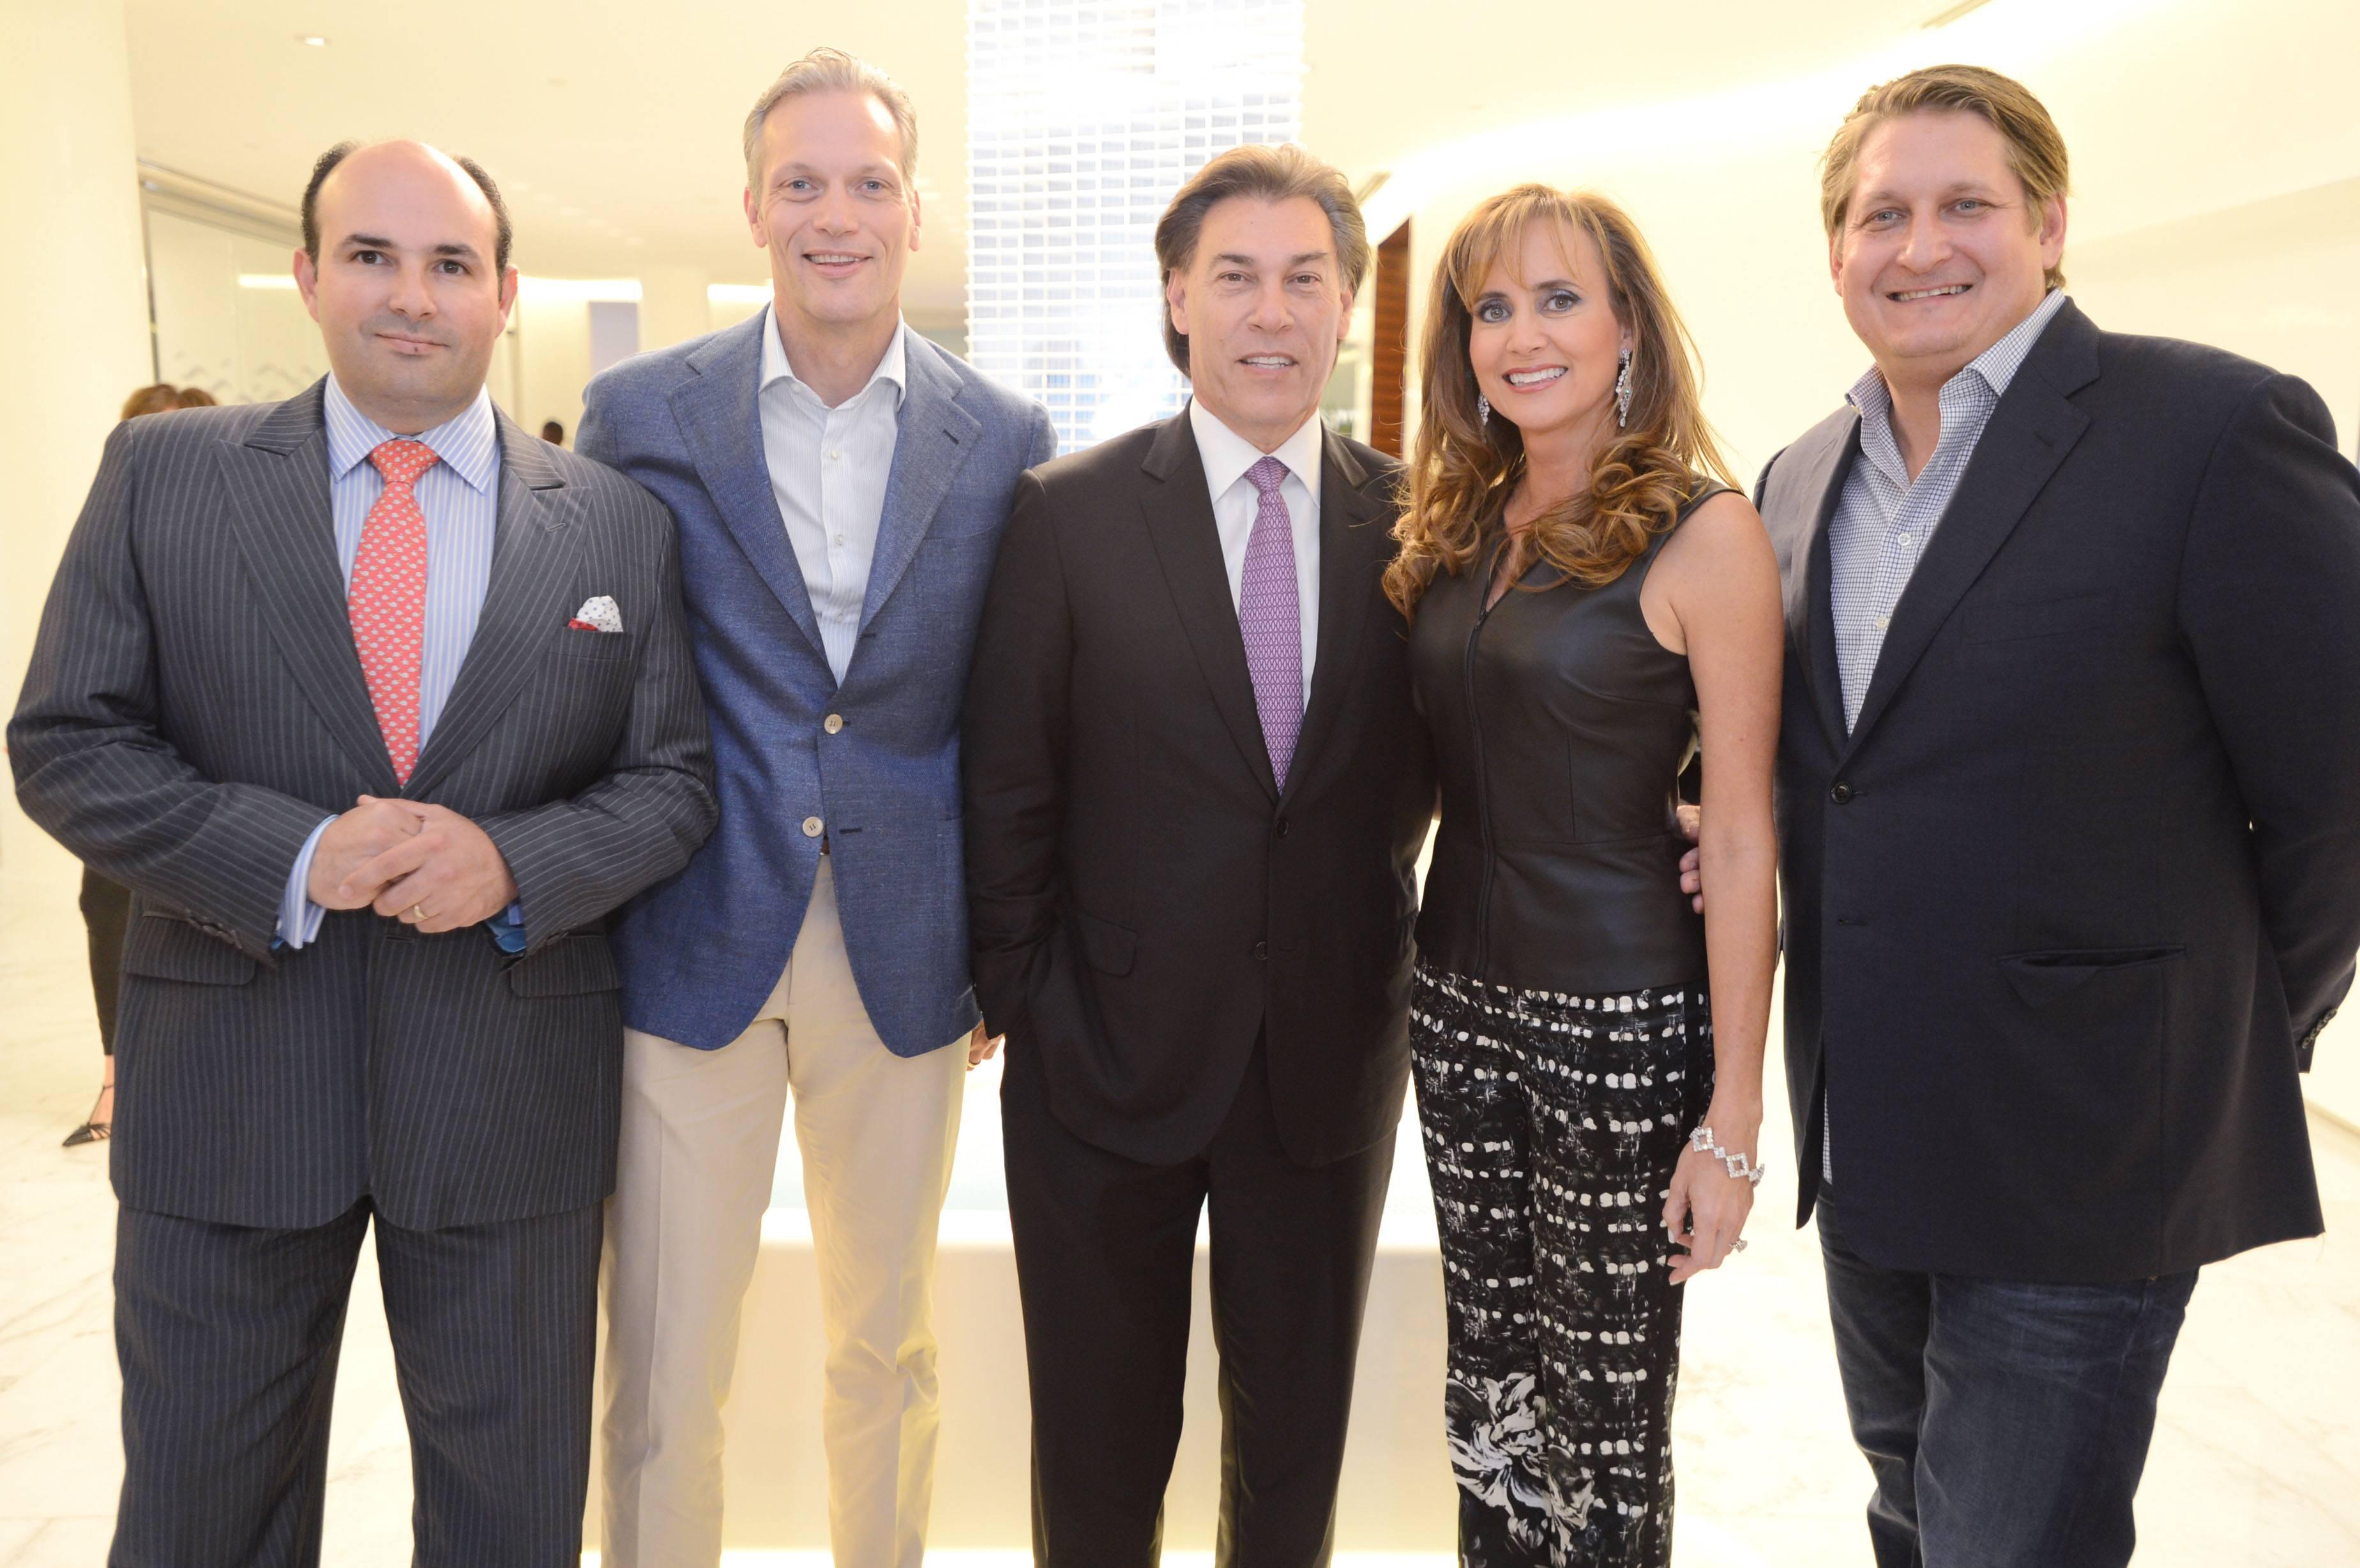 Alejandro Cuellar, Marc Hruschka, Edgardo Defortuna, Ana Cristina Defortuna, Courtland Lantaff